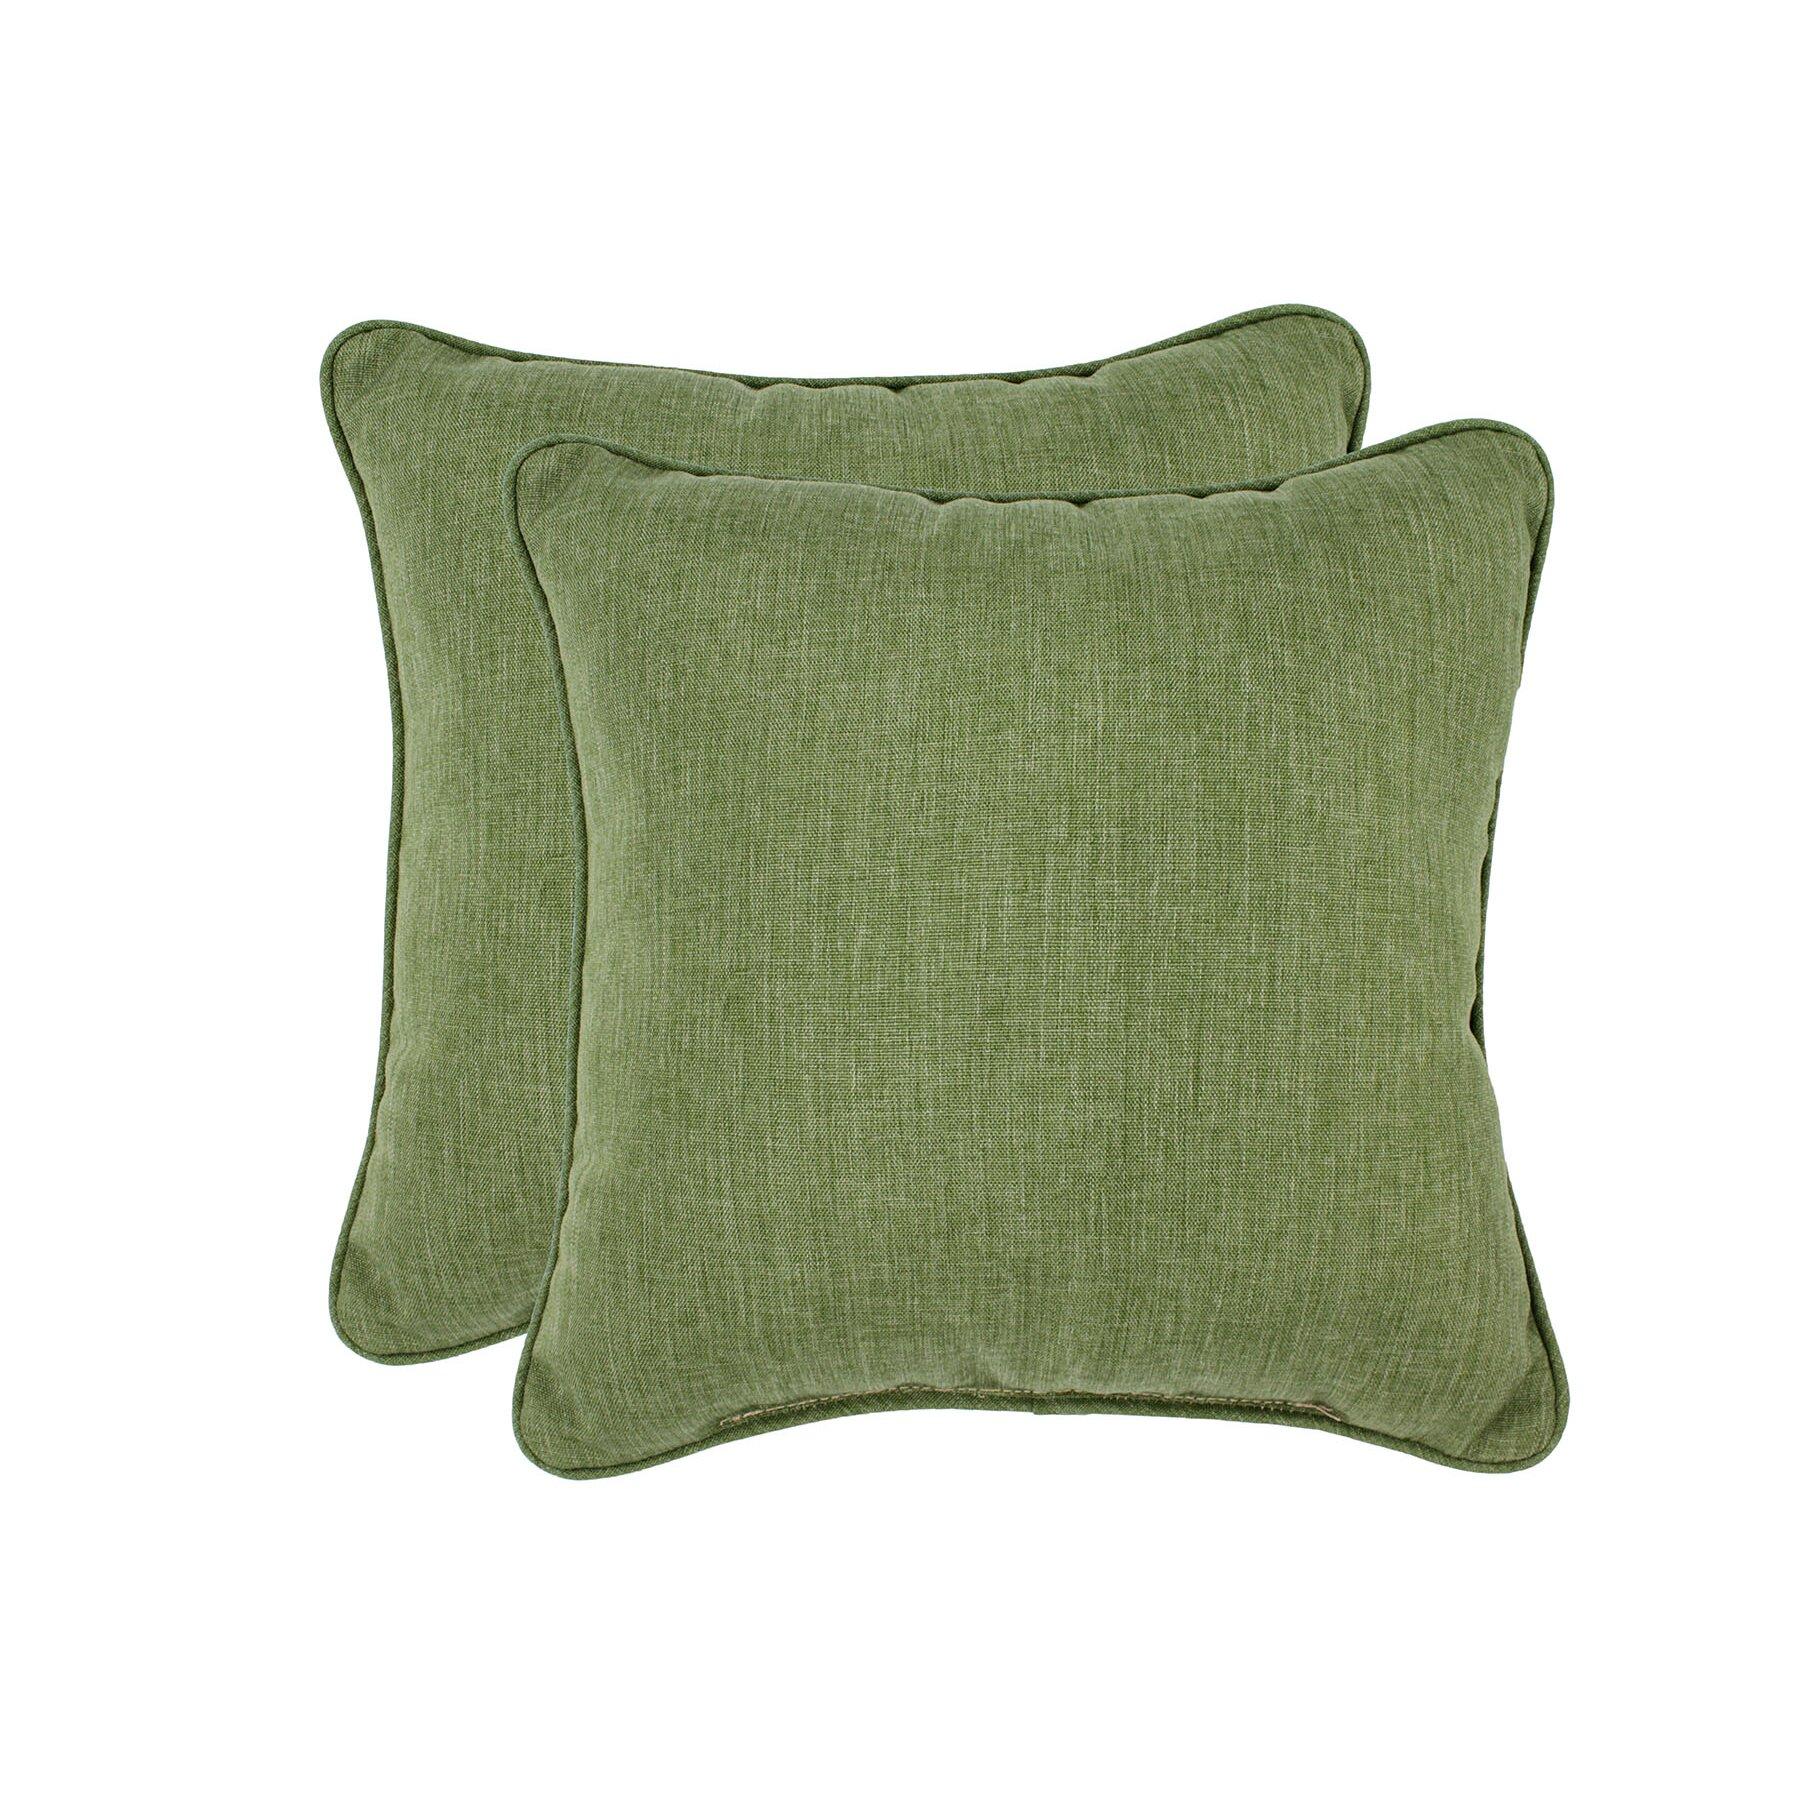 Throw Pillow Outdoor : Beachcrest Home Eton Outdoor Throw Pillow & Reviews Wayfair